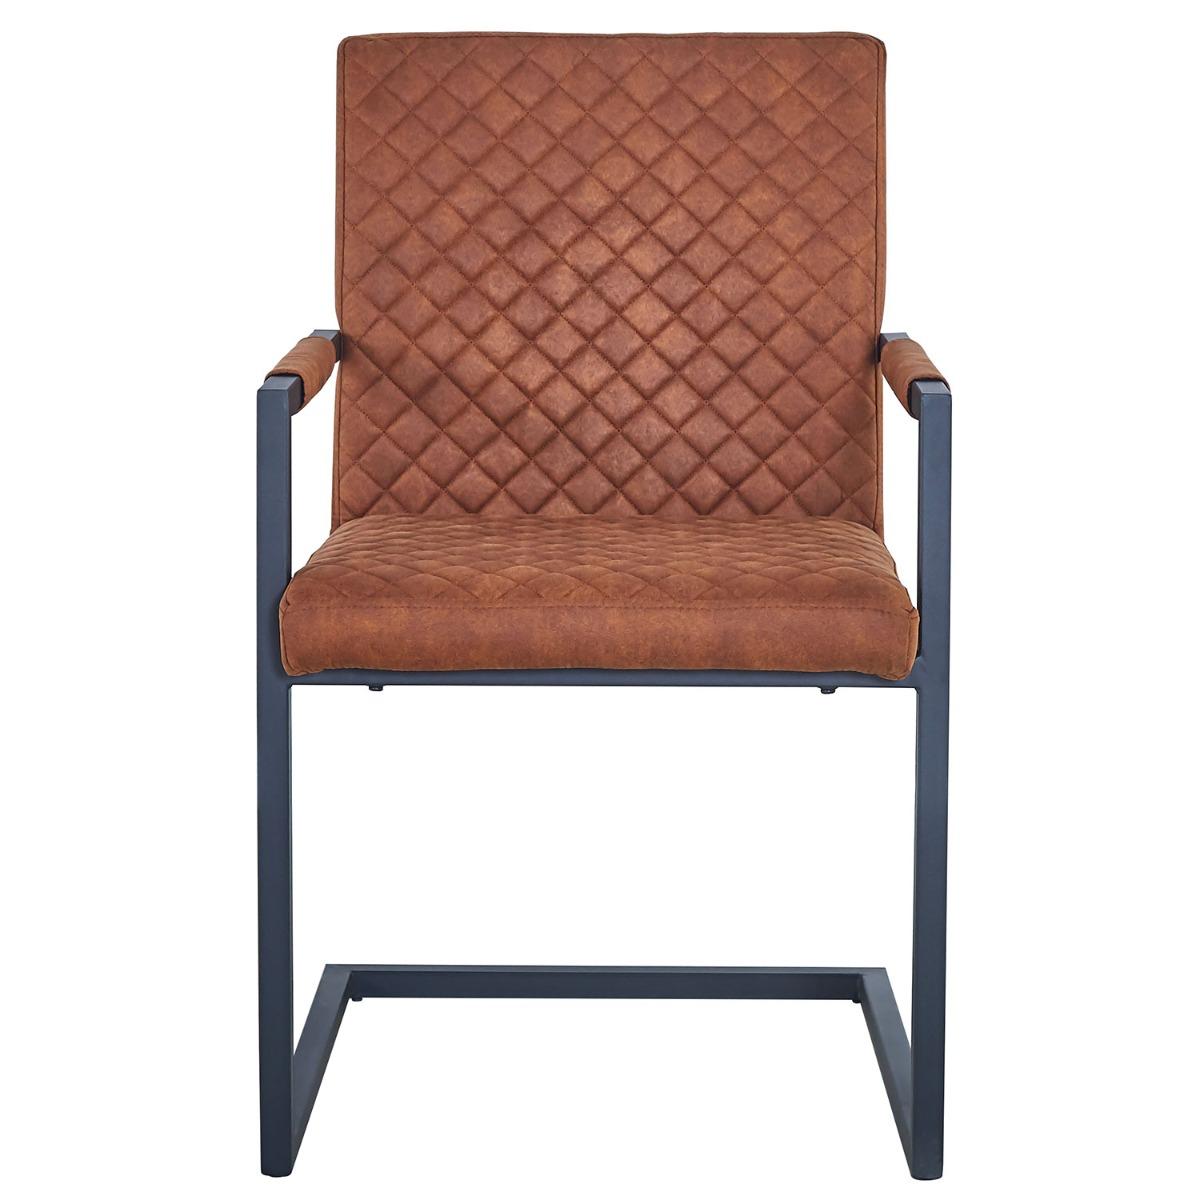 Set van 2 Kansas gewatteerde stoelen in verouderde bruine stof